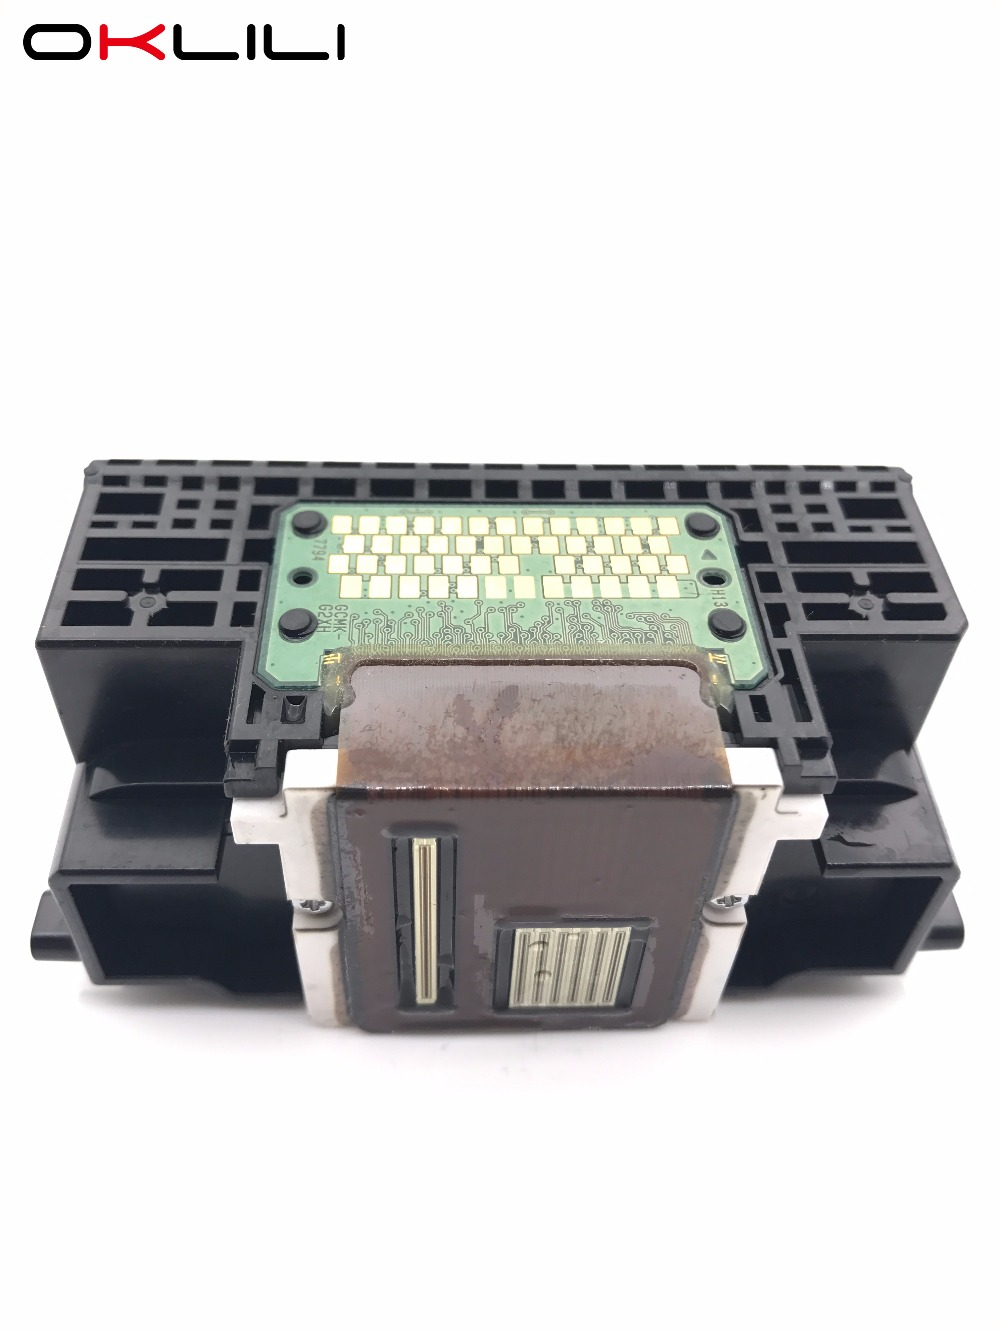 small resolution of qy6 0080 printhead printer head print head for canon ip4820 ip4840 ip4850 ix6520 ix6550 mx715